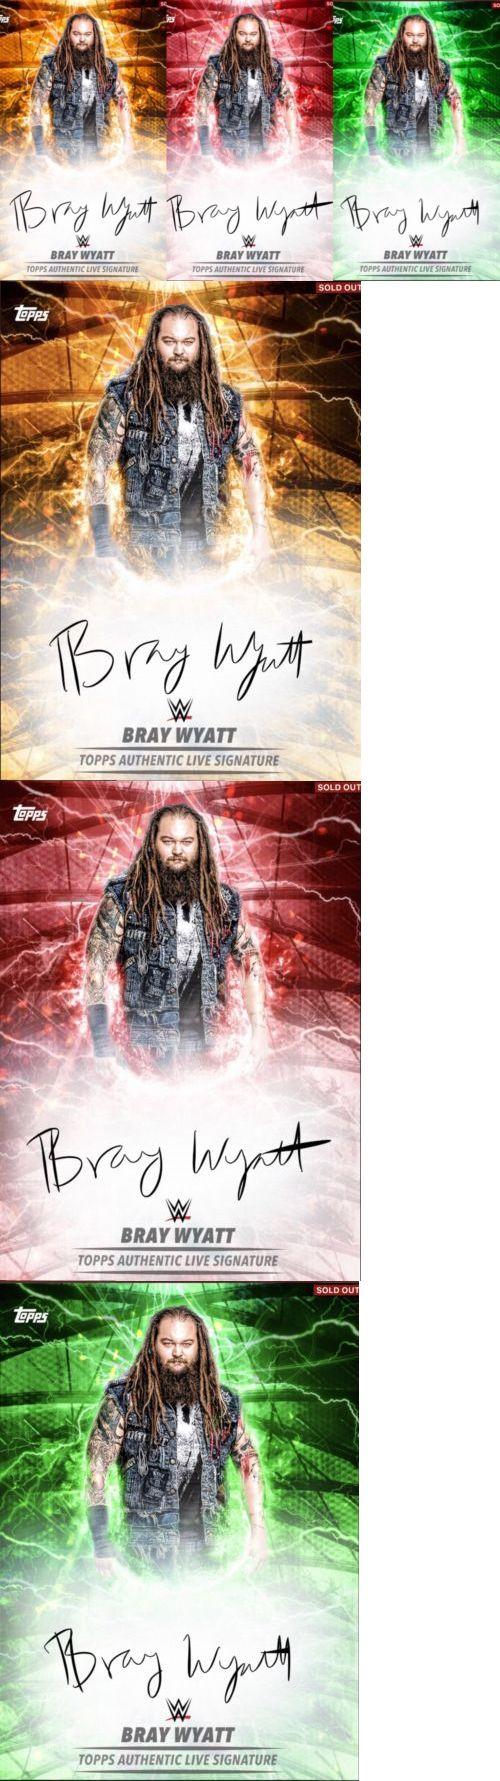 Wrestling Cards 183435: Topps Wwe Slam Digital Live Signature Bray Wyatt Lot 3 -> BUY IT NOW ONLY: $34.99 on eBay!